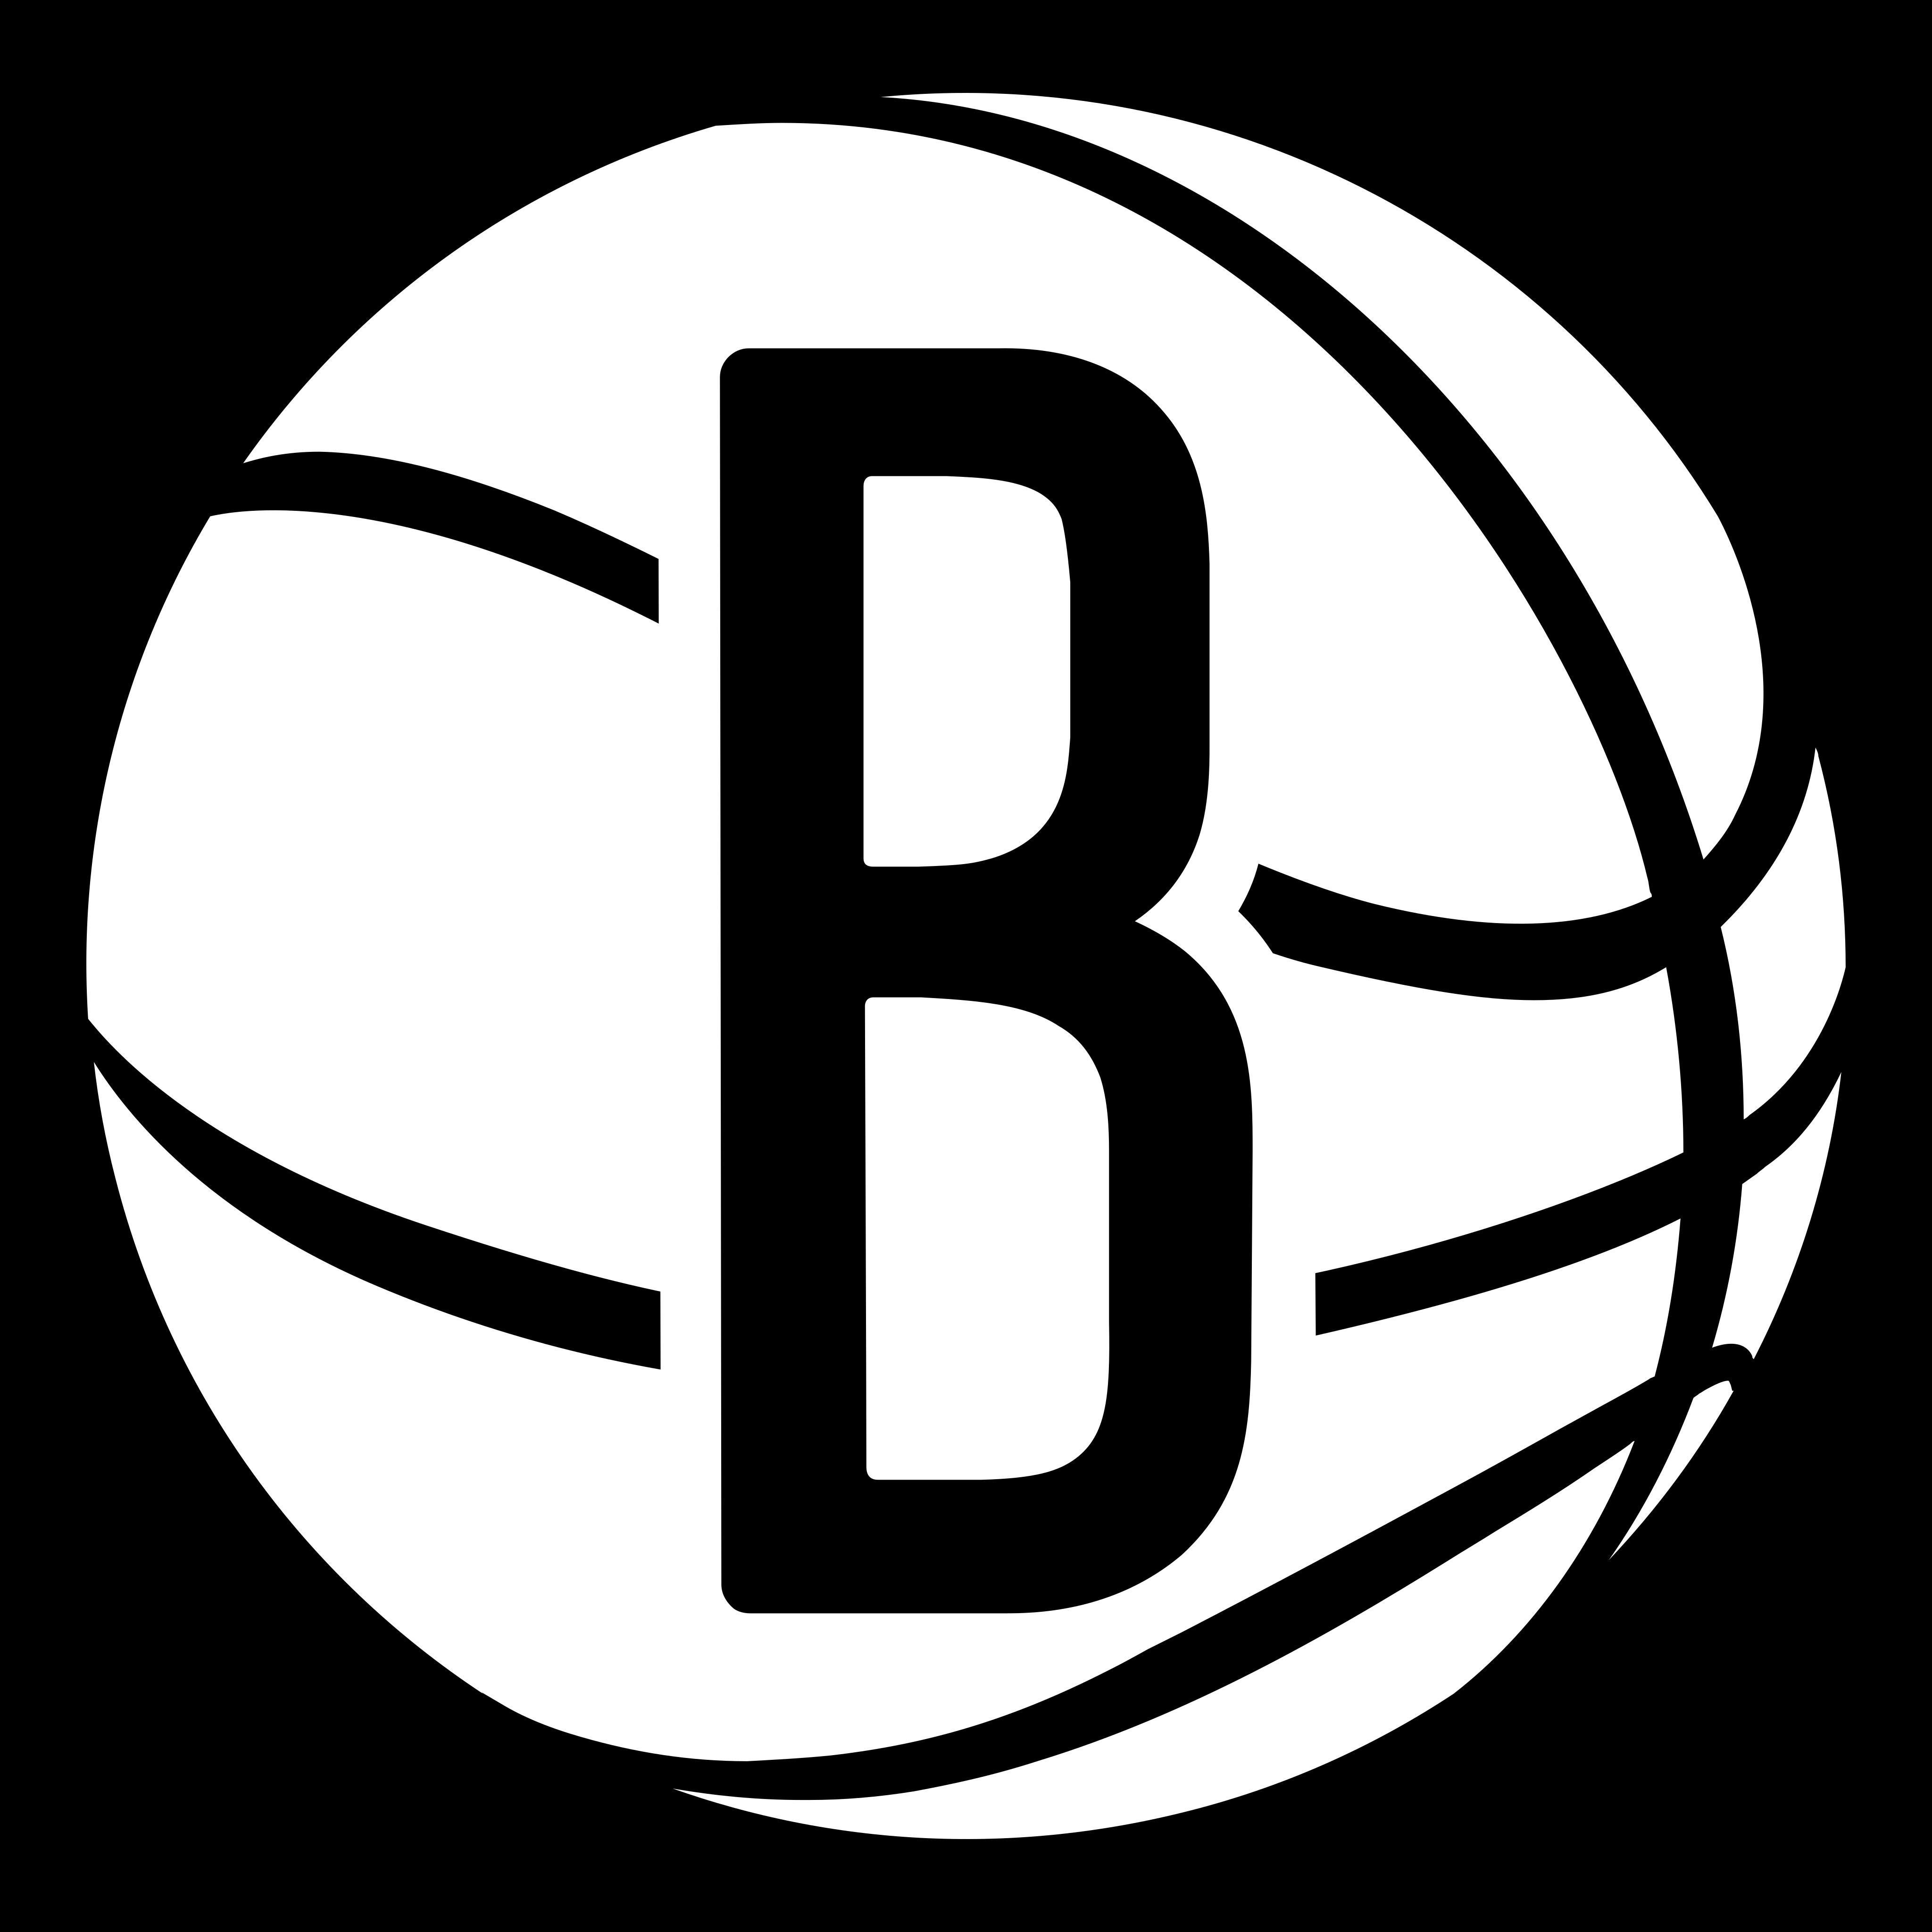 brooklyn nets logo - Brooklyn Nets Logo